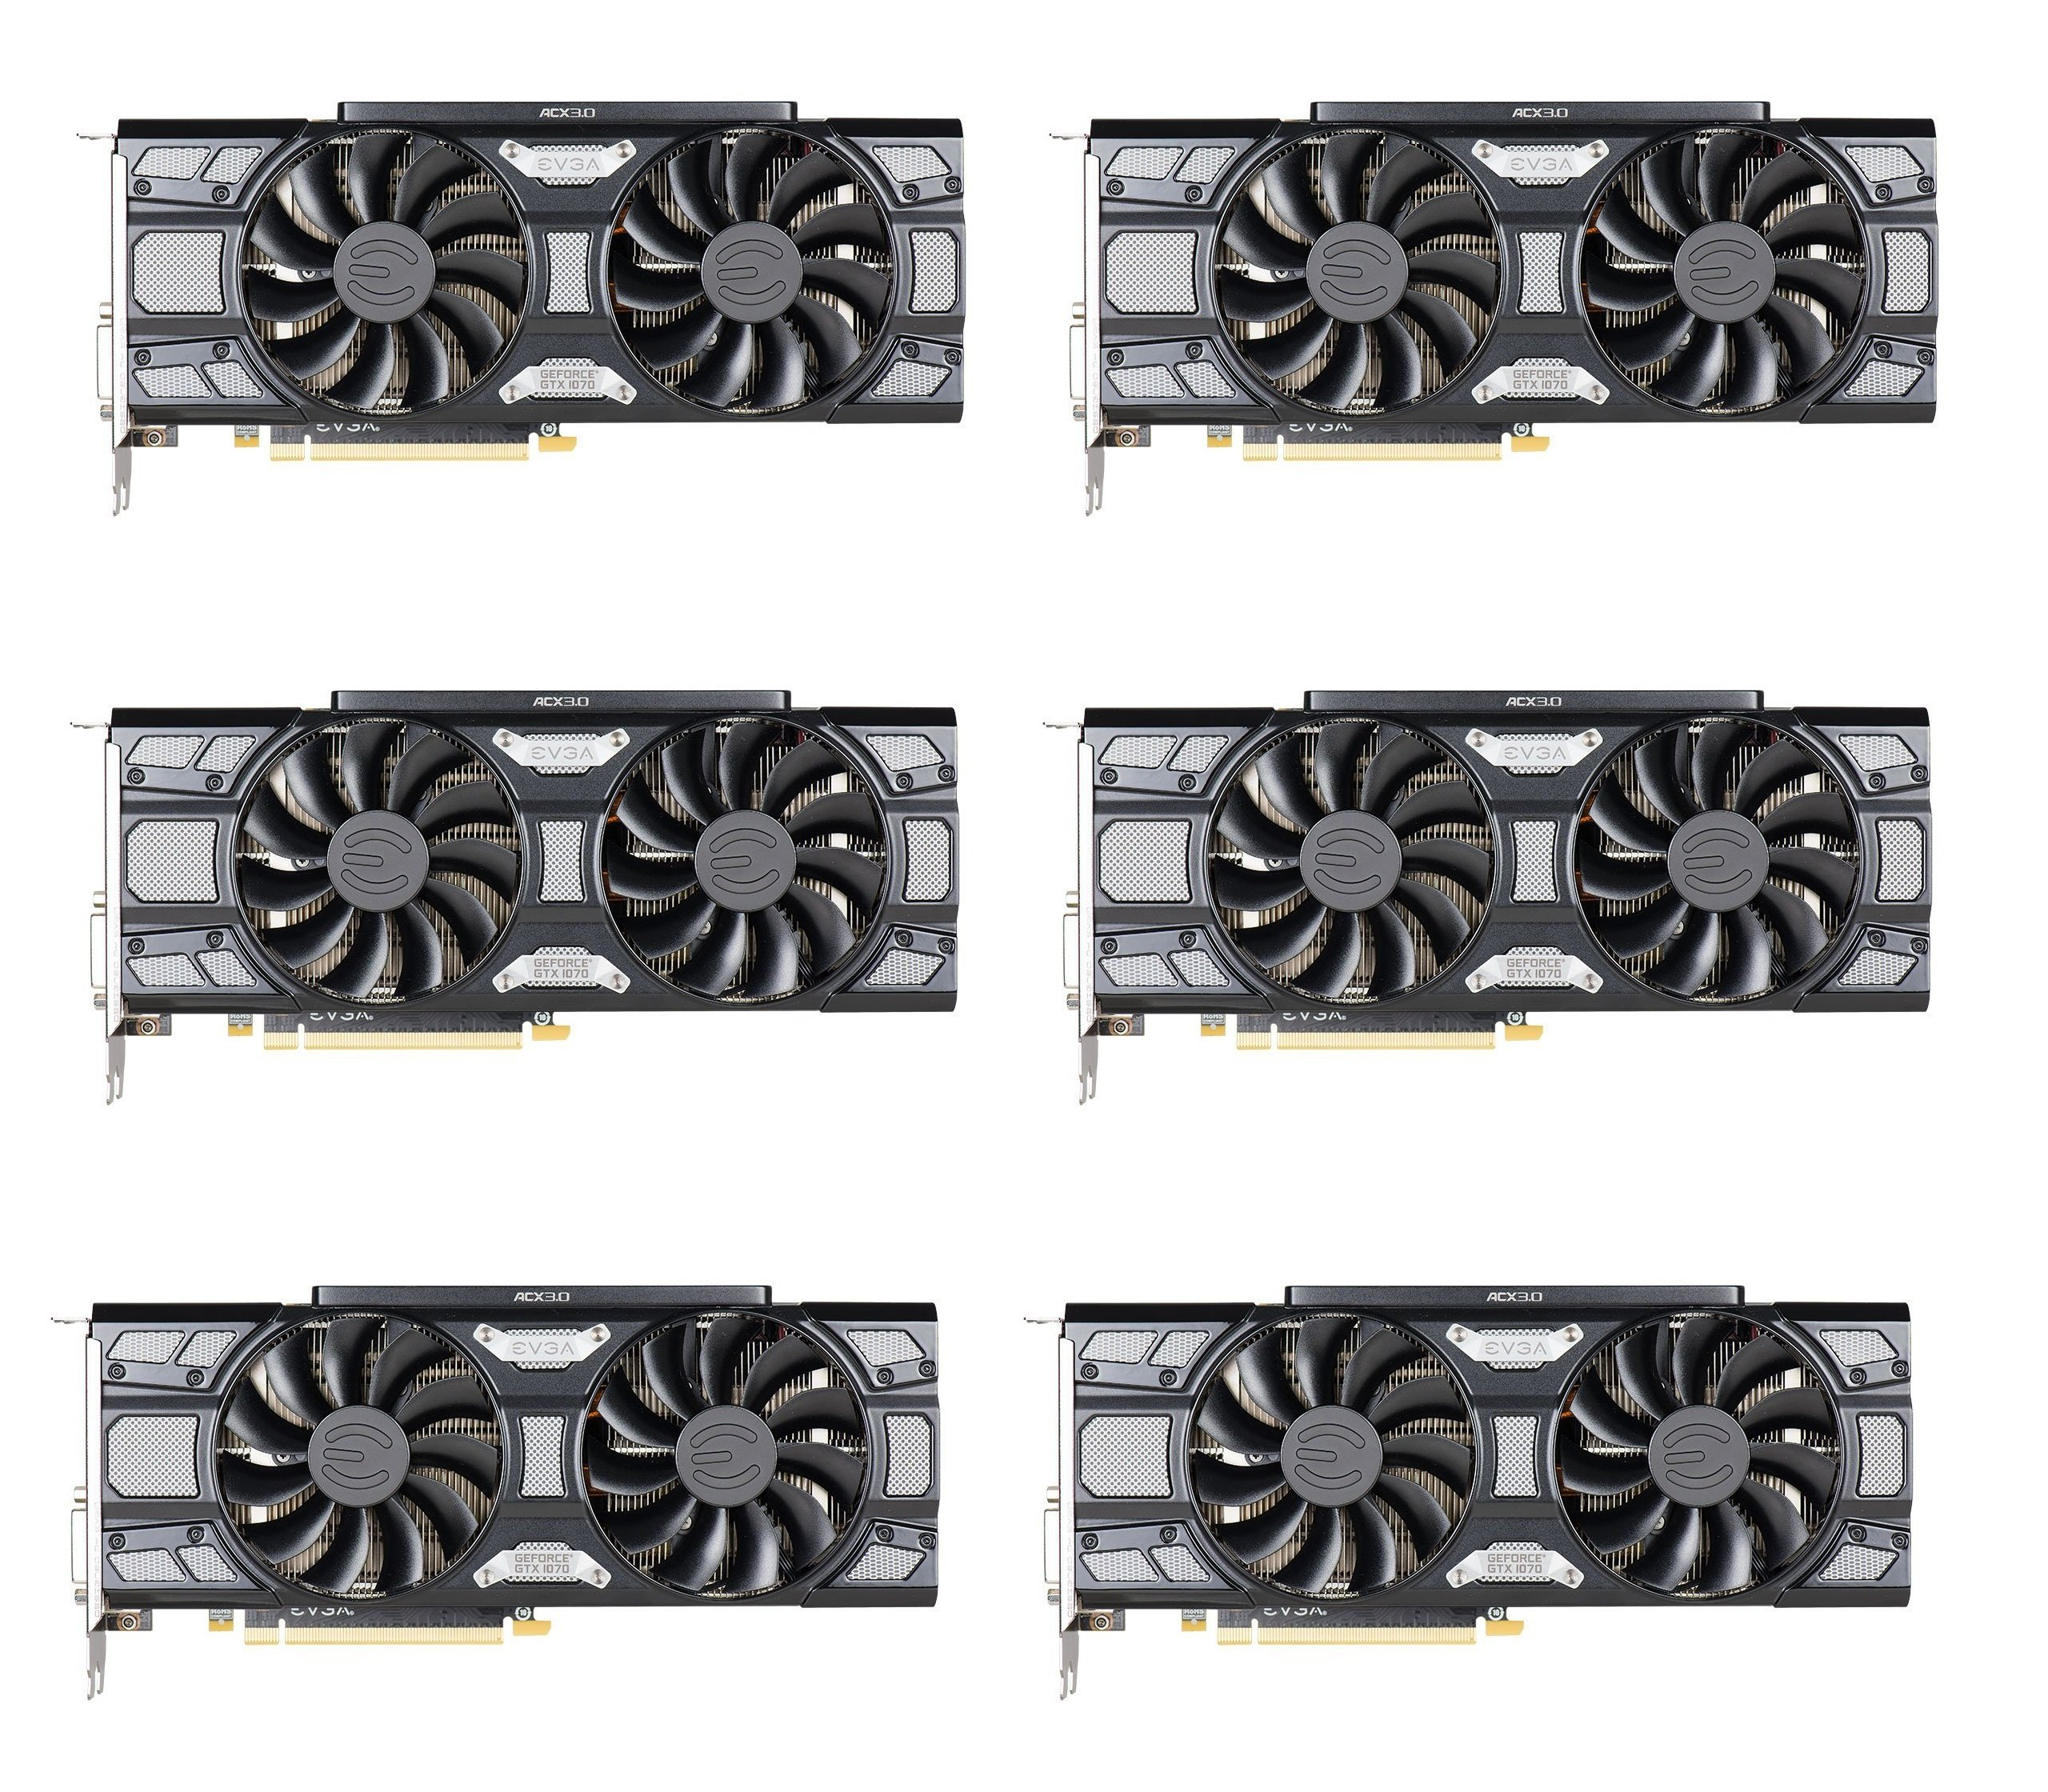 6 Packs of EVGA GeForce GTX 1070 SC GAMING ACX 3.0 Black Edition, 8GB GDDR5, LED, DX12 OSD Support (PXOC) 08G-P4-5173-KR